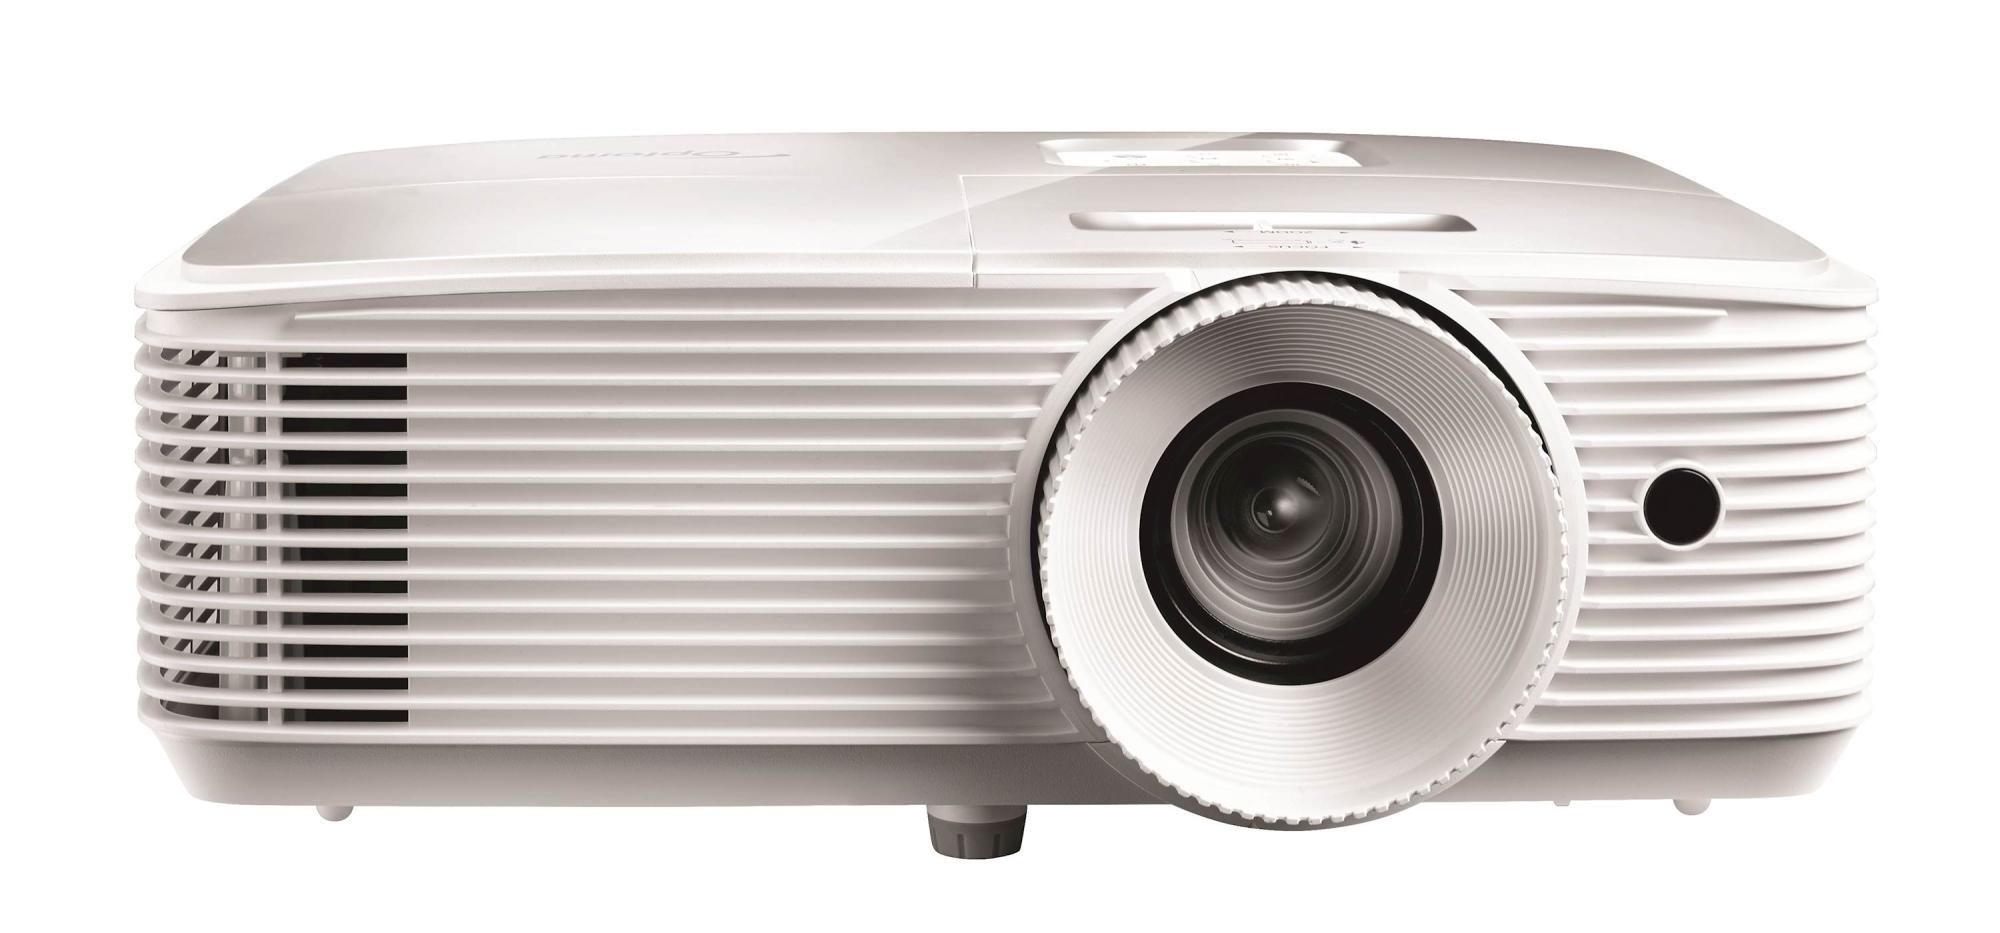 EH334 PROYECTOR PARA ESCRITORIO 3600LúMENES ANSI DLP 1080P (1920X1080) 3D BLANCO VIDEOPROYECTOR VIDEOPROYECTORES